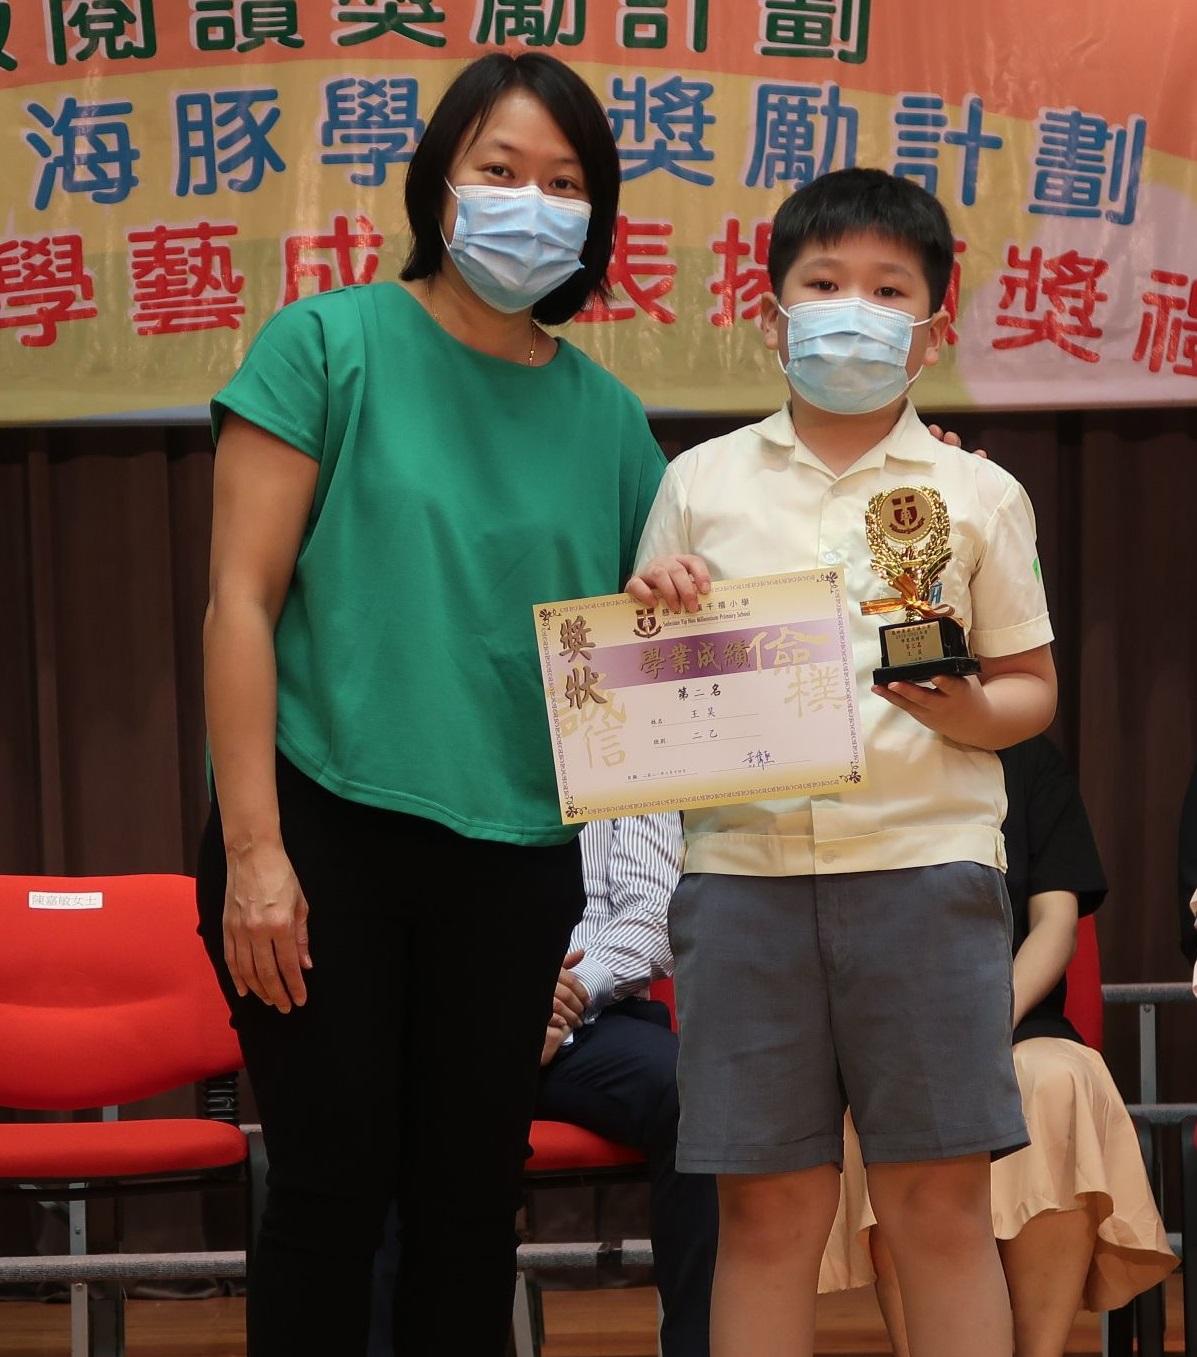 https://syh.edu.hk/sites/default/files/img_5405.jpg